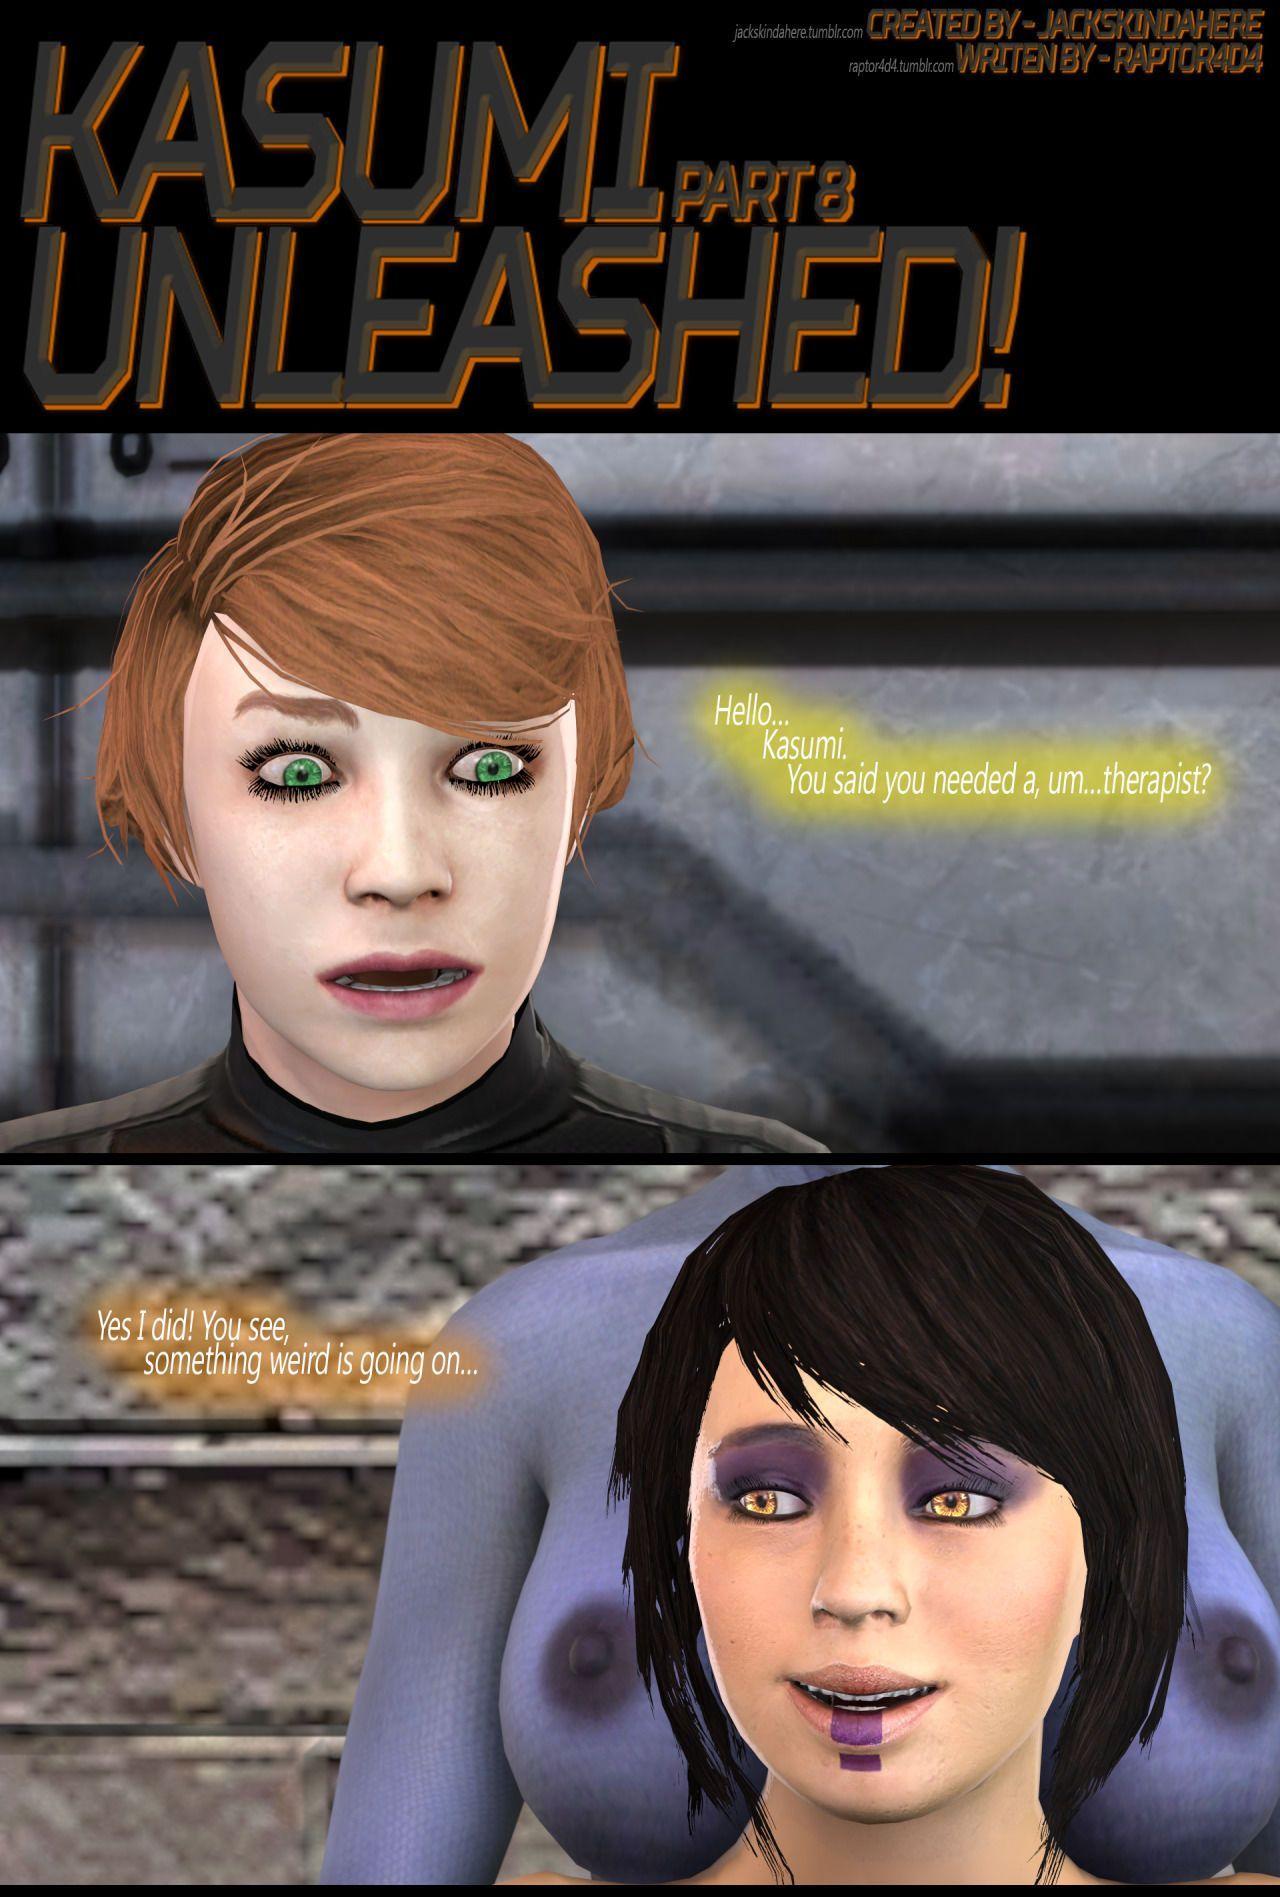 [JacksKindaHere] Kasumi Unleashed (In Progress) - part 3